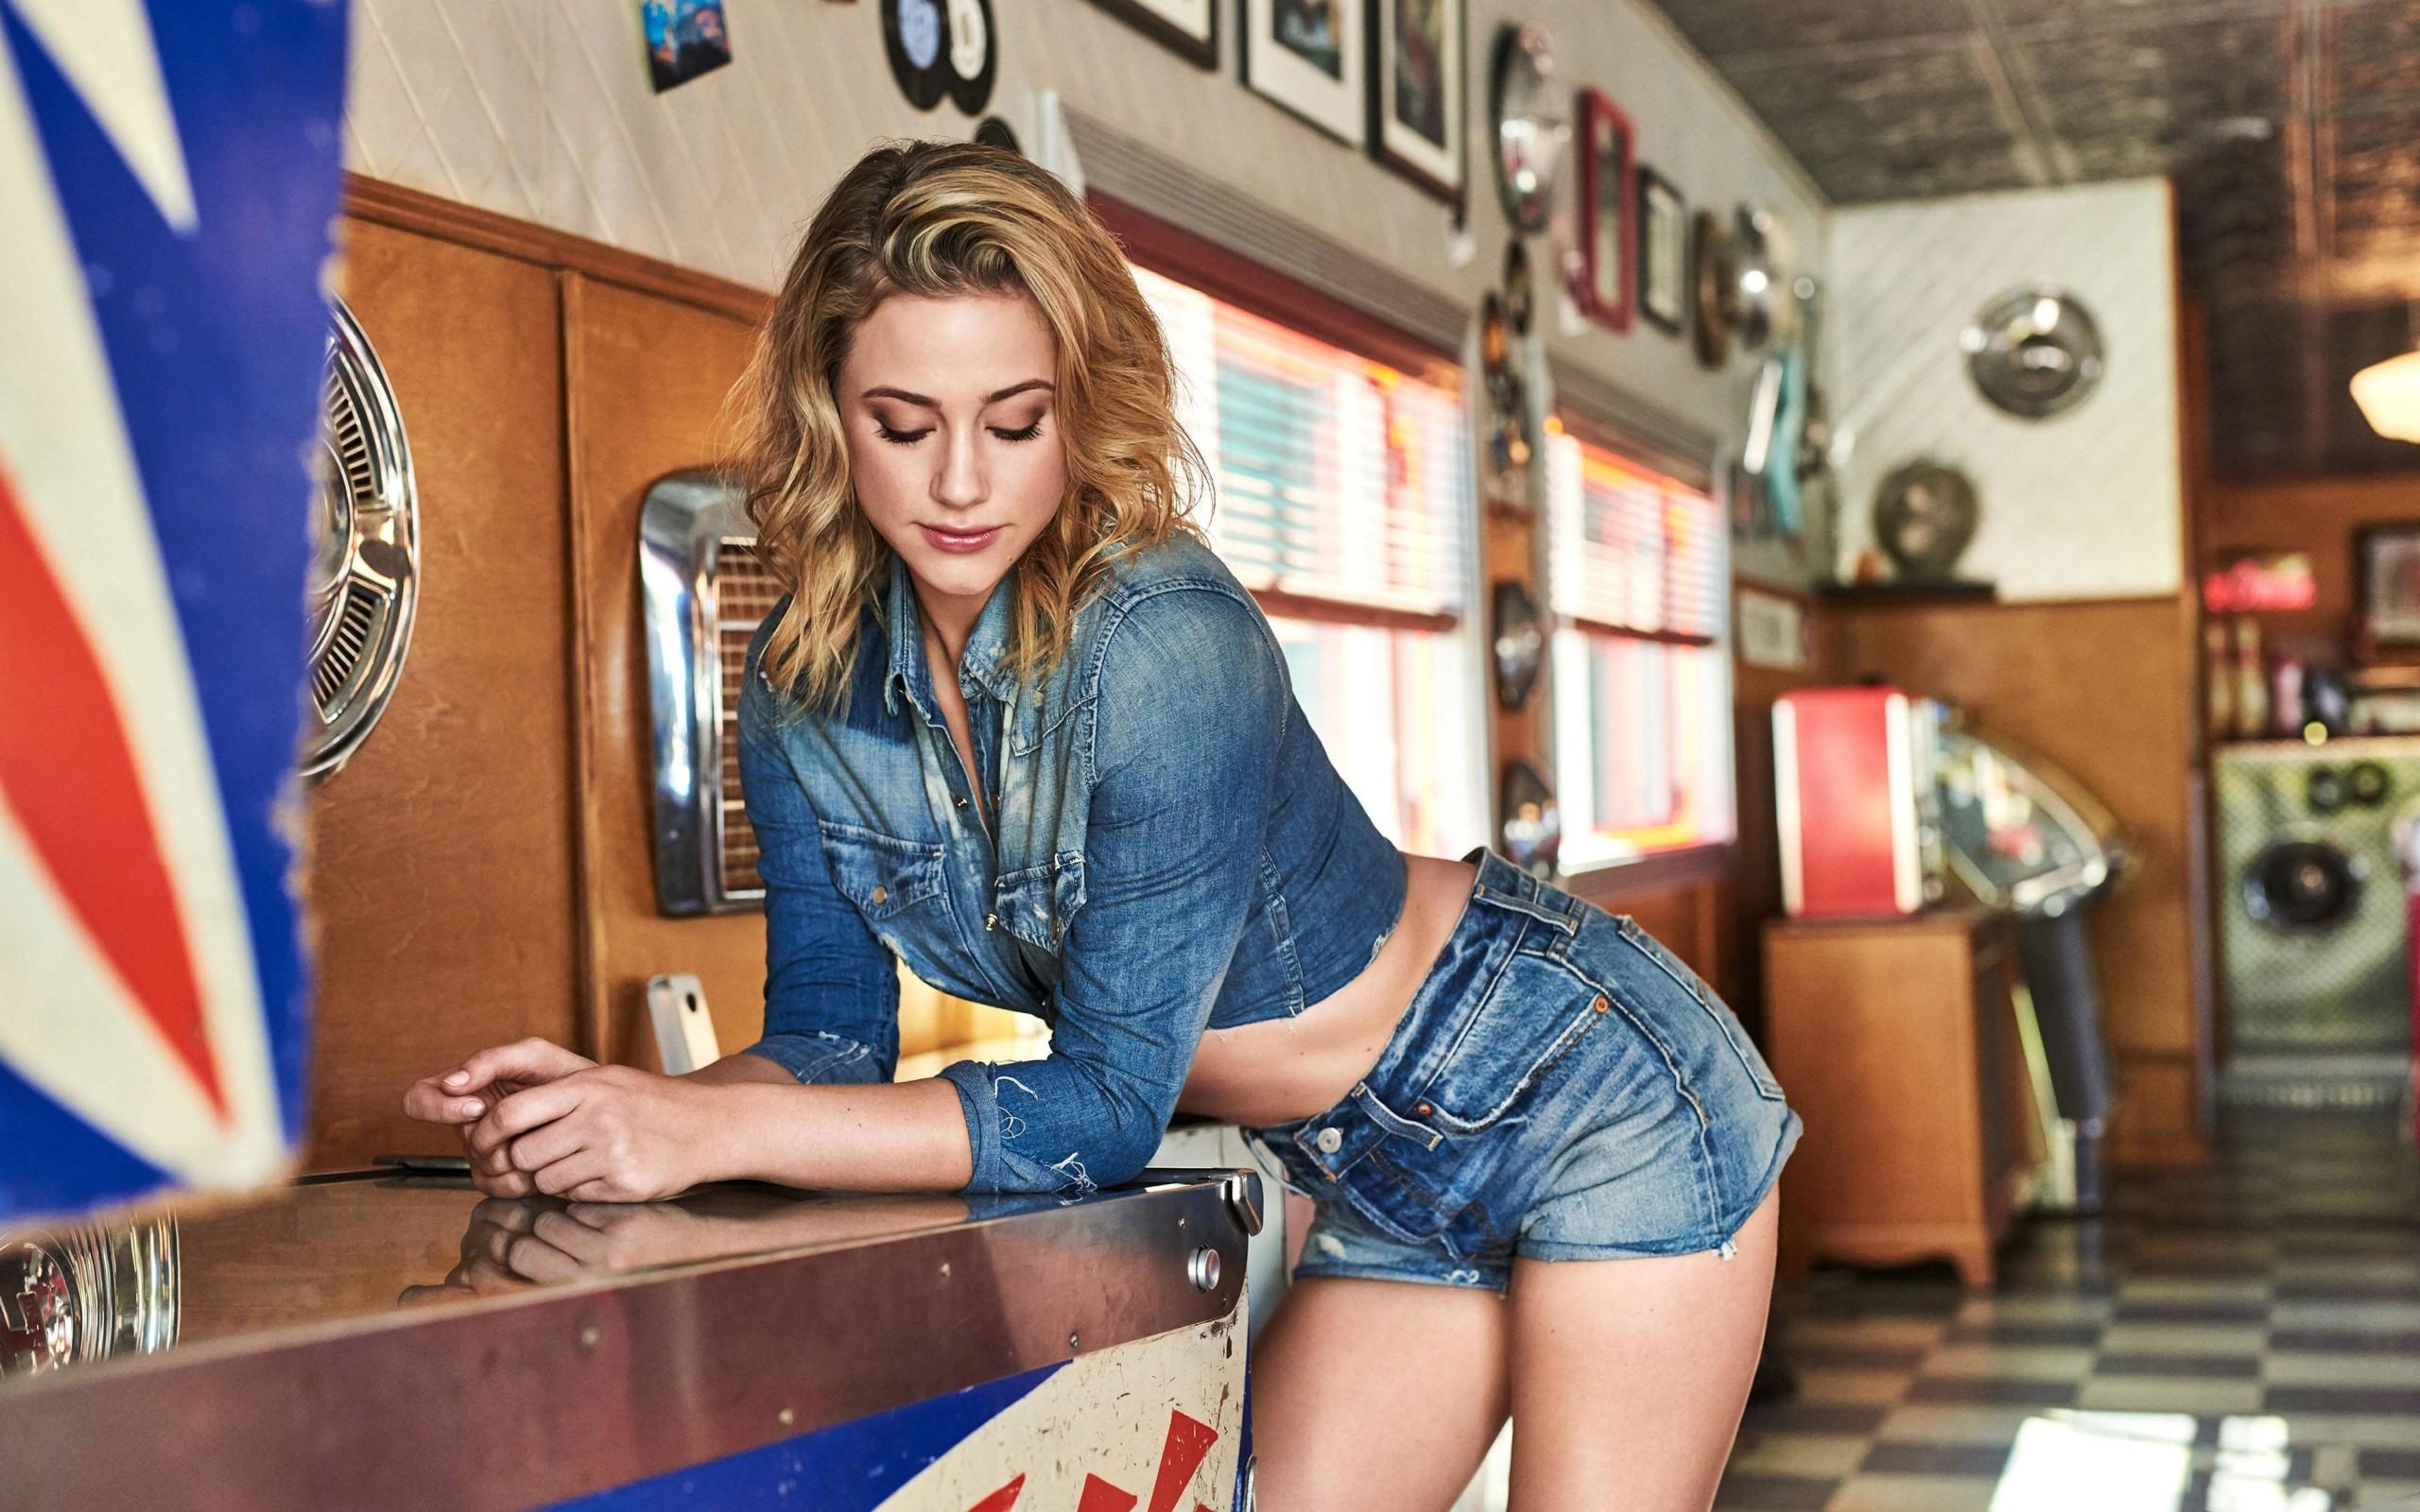 Ellie Goulding Wallpaper Iphone Lili Reinhart Hot 2018 4k Wallpapers Hd Wallpapers Id